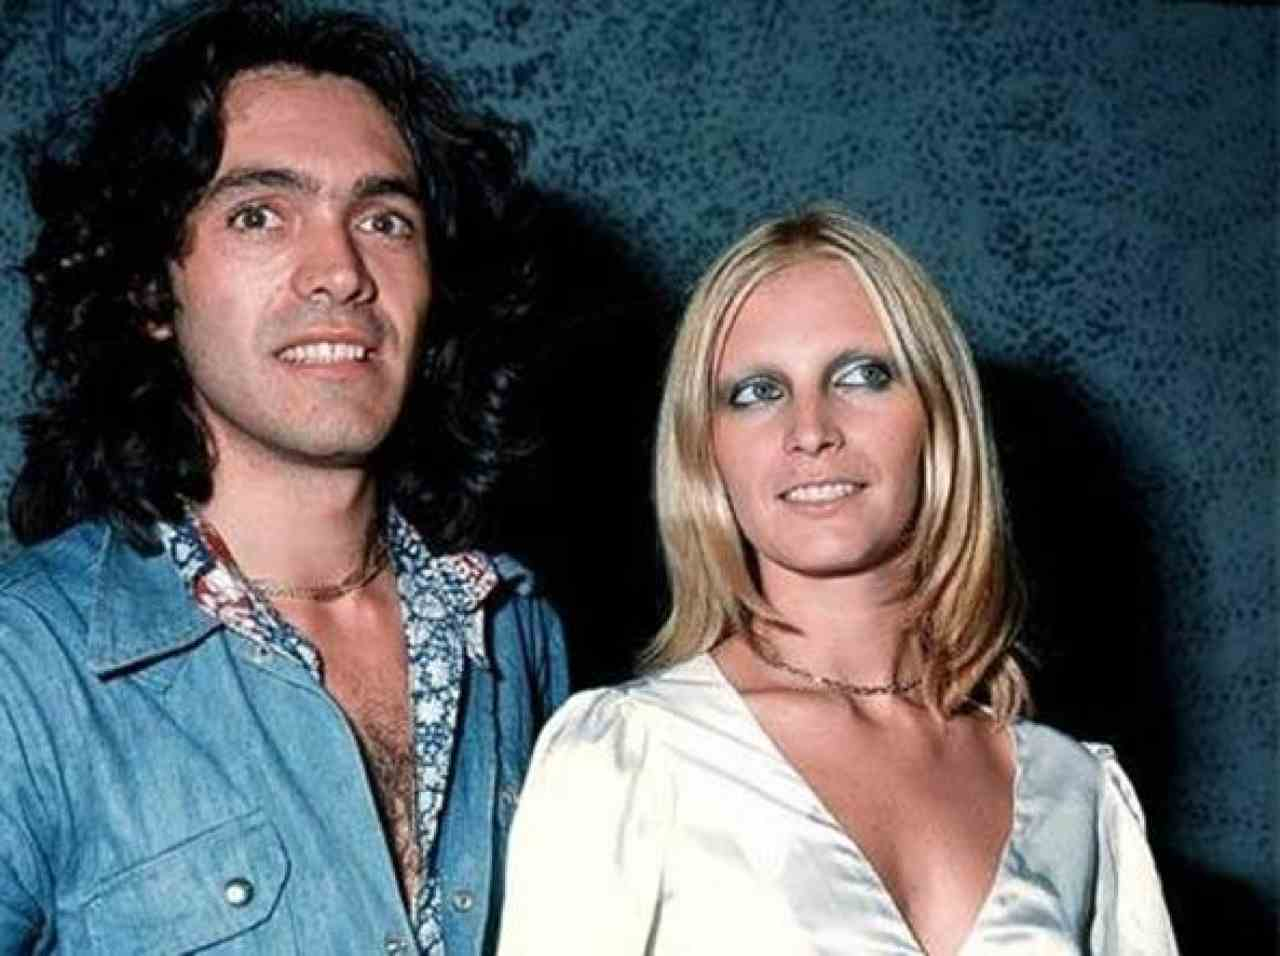 Riccardo Fogli e Patty Pravo